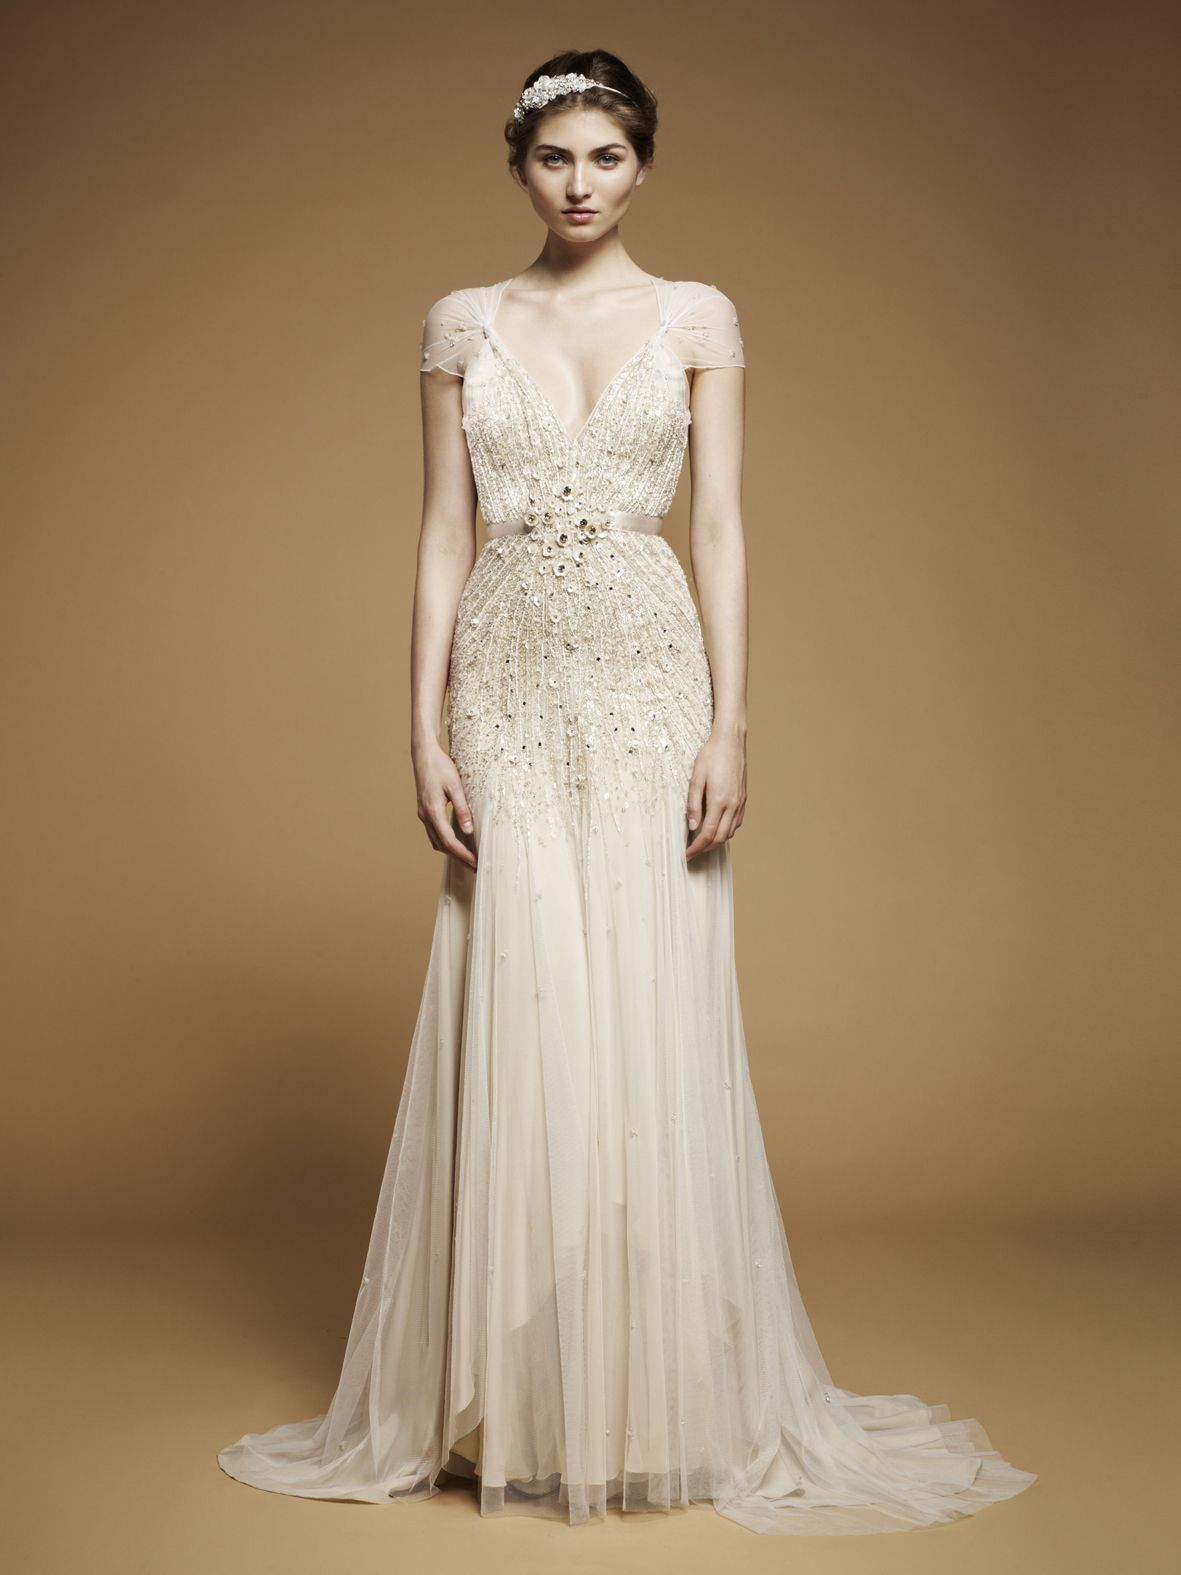 Photo via style inspiration pinterest wedding dresses jenny